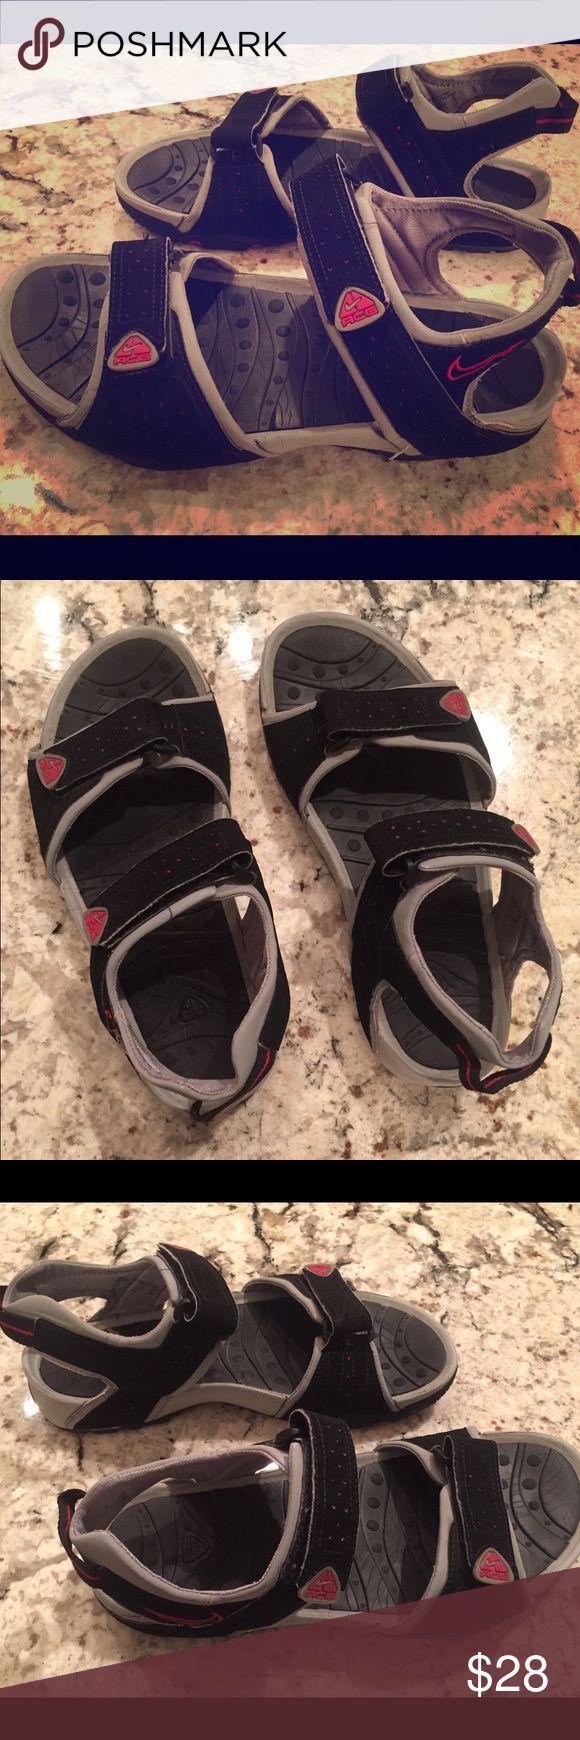 Men's Nike Sandals Size 9 - great condition Nike Shoes Sandals & Flip-Flops